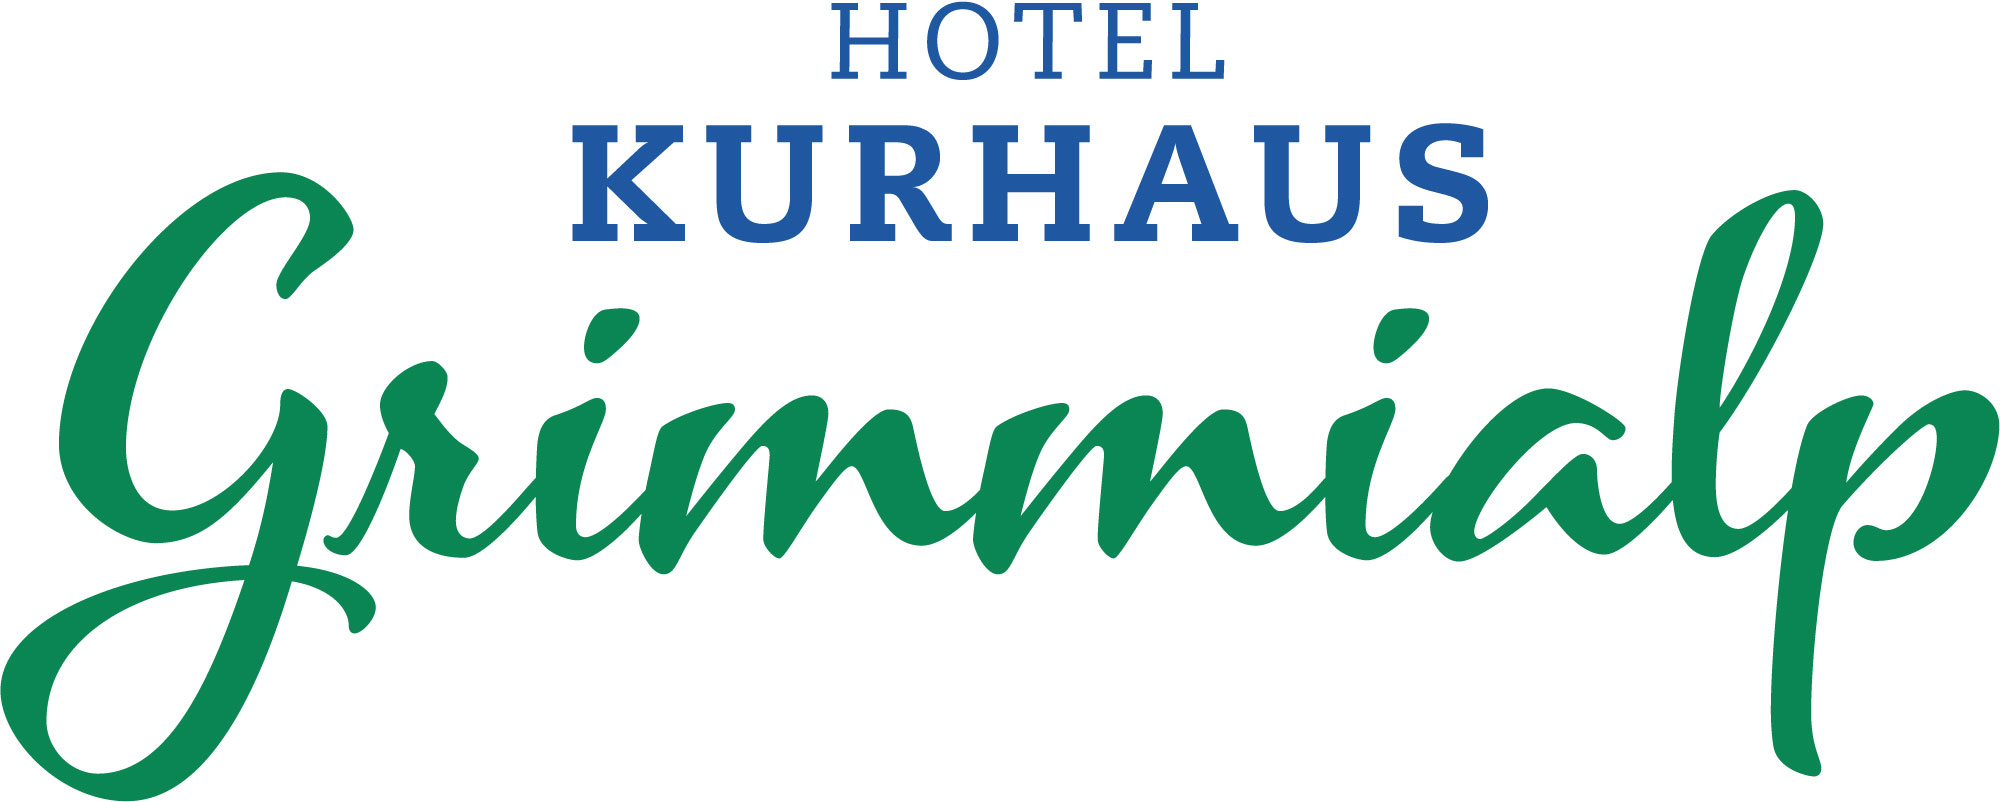 Hotel Kurhaus Grimmialp